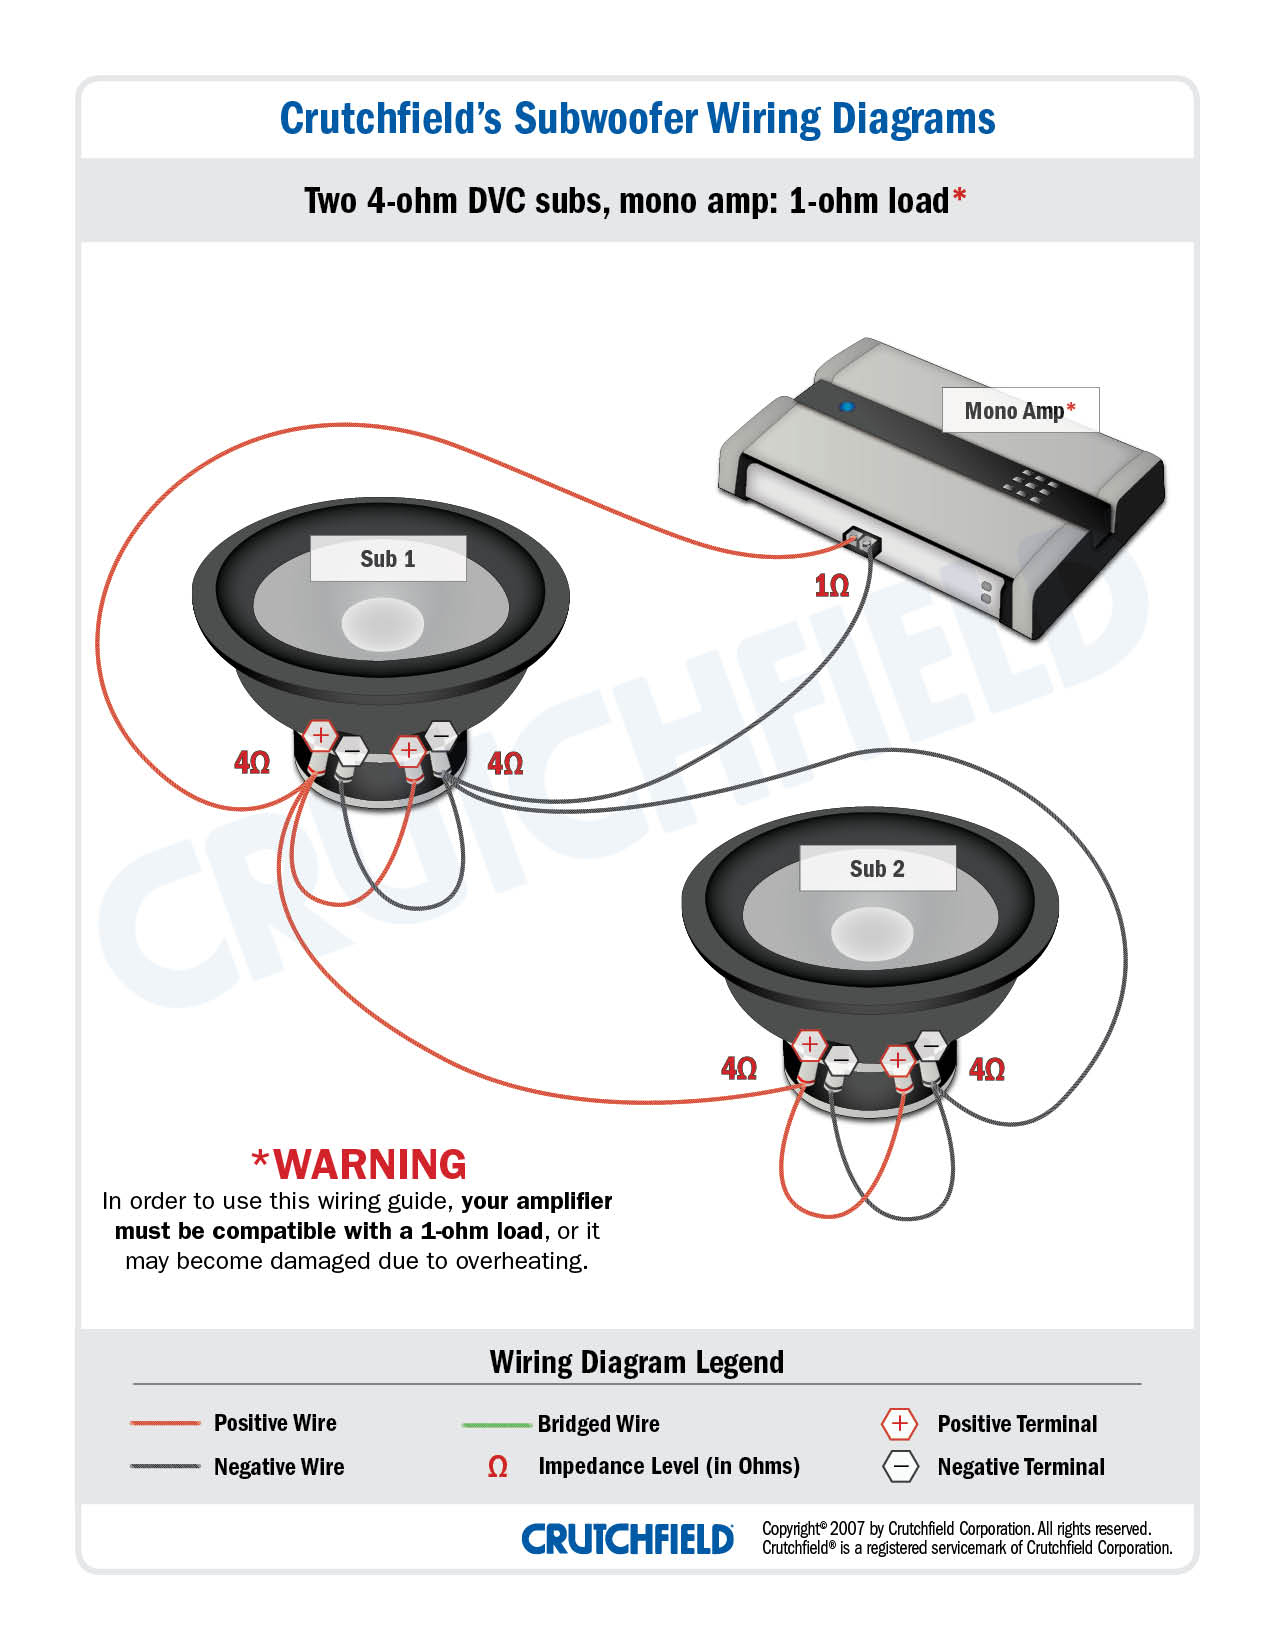 Rockford Fosgate Dual Amp Wiring Diagram | Wiring Diagram - Rockford Fosgate Amp Wiring Diagram